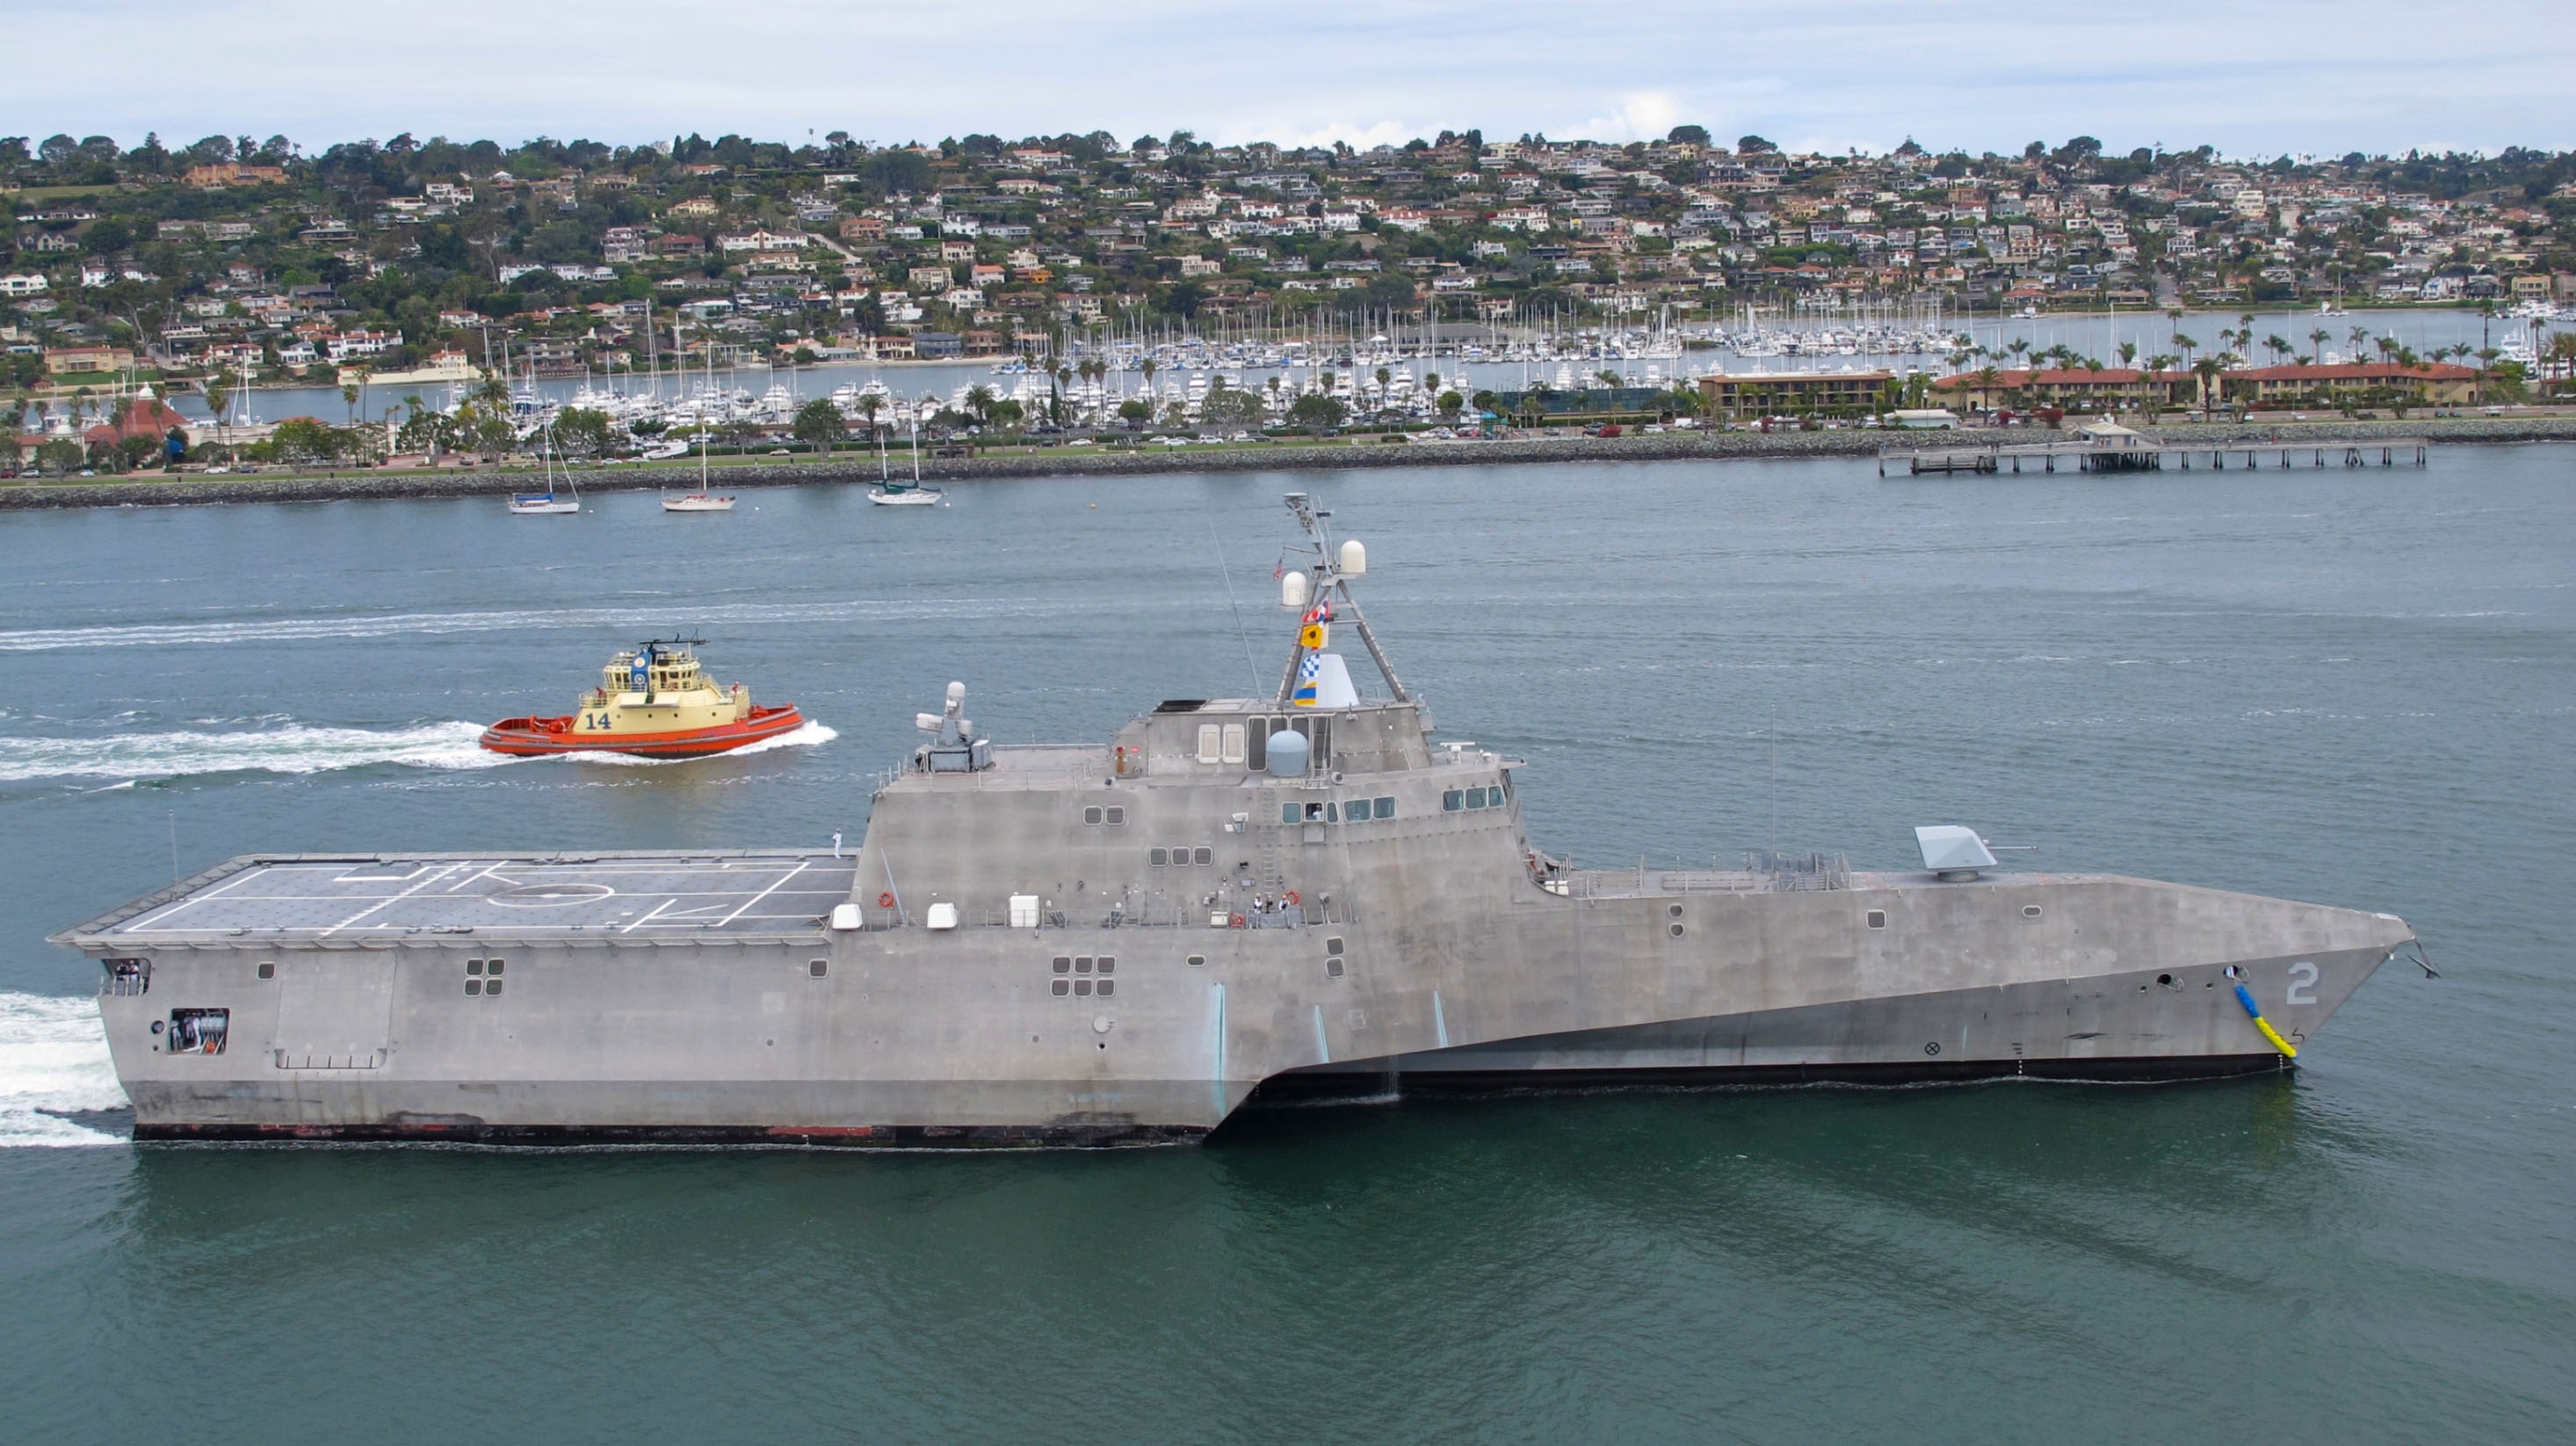 USS INDEPENDENCE LCS-2 Bild: U.S. Navy